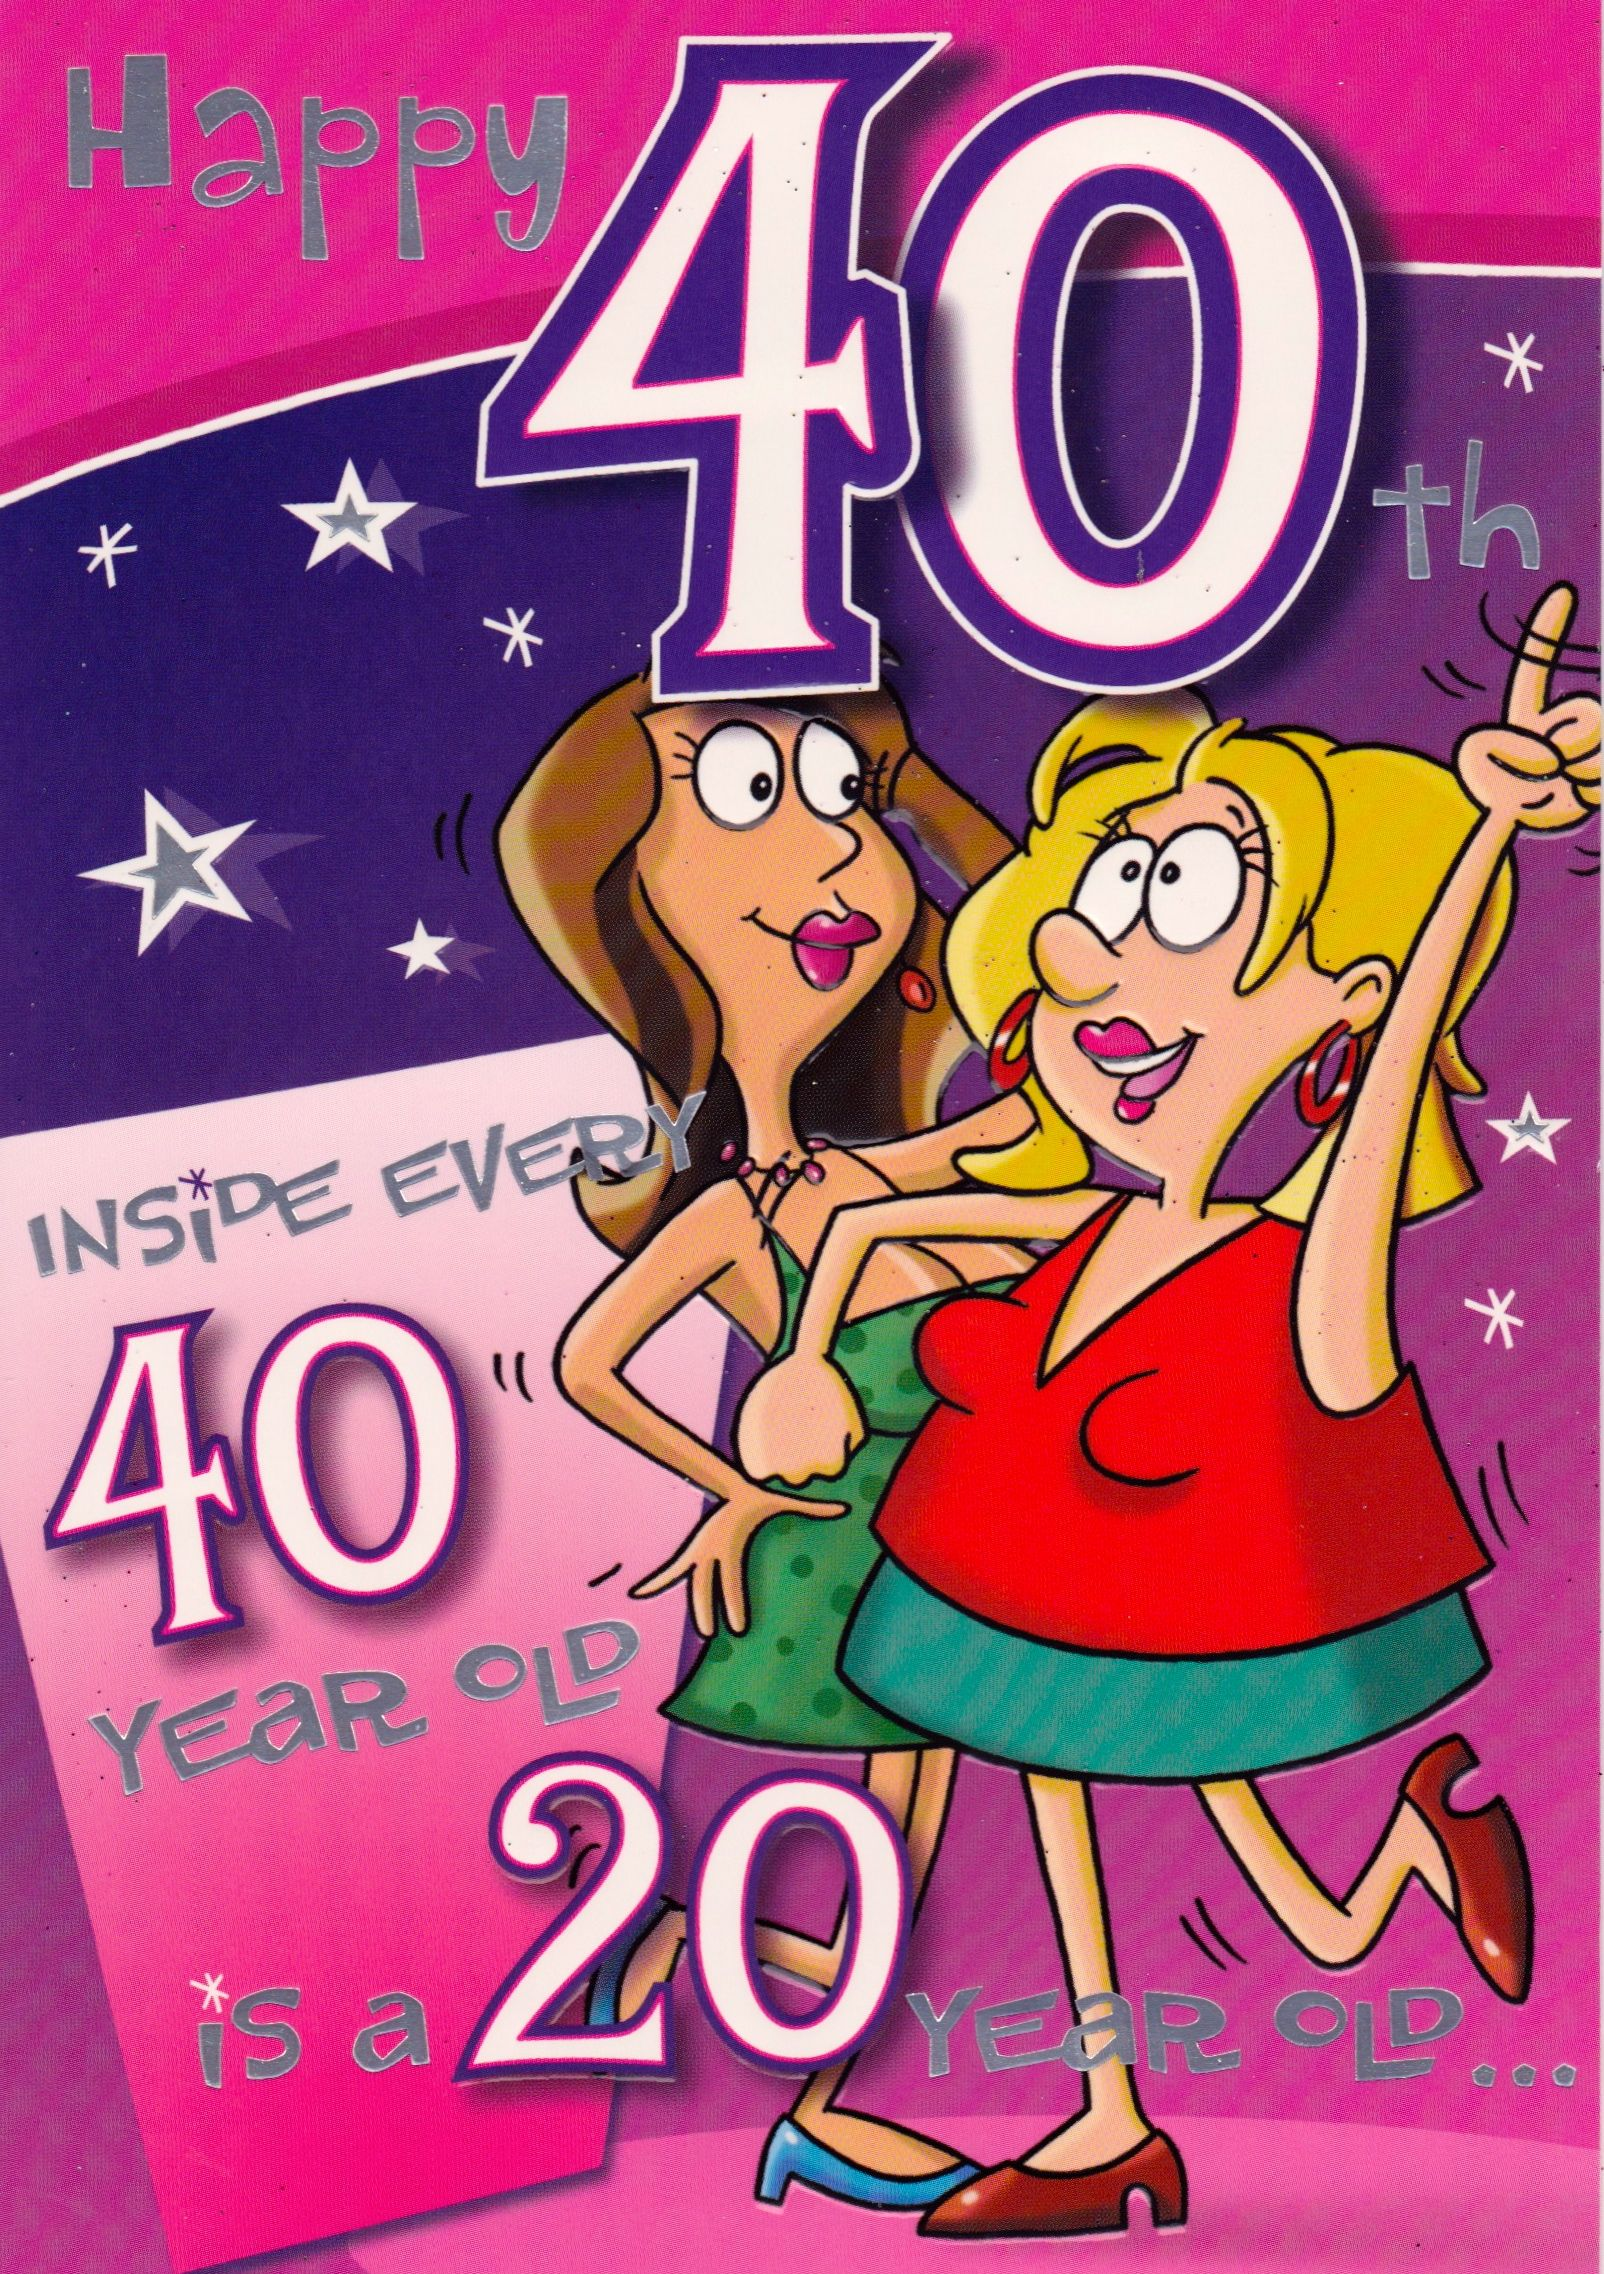 birthday invitations card ideas for her 40th birthday happy